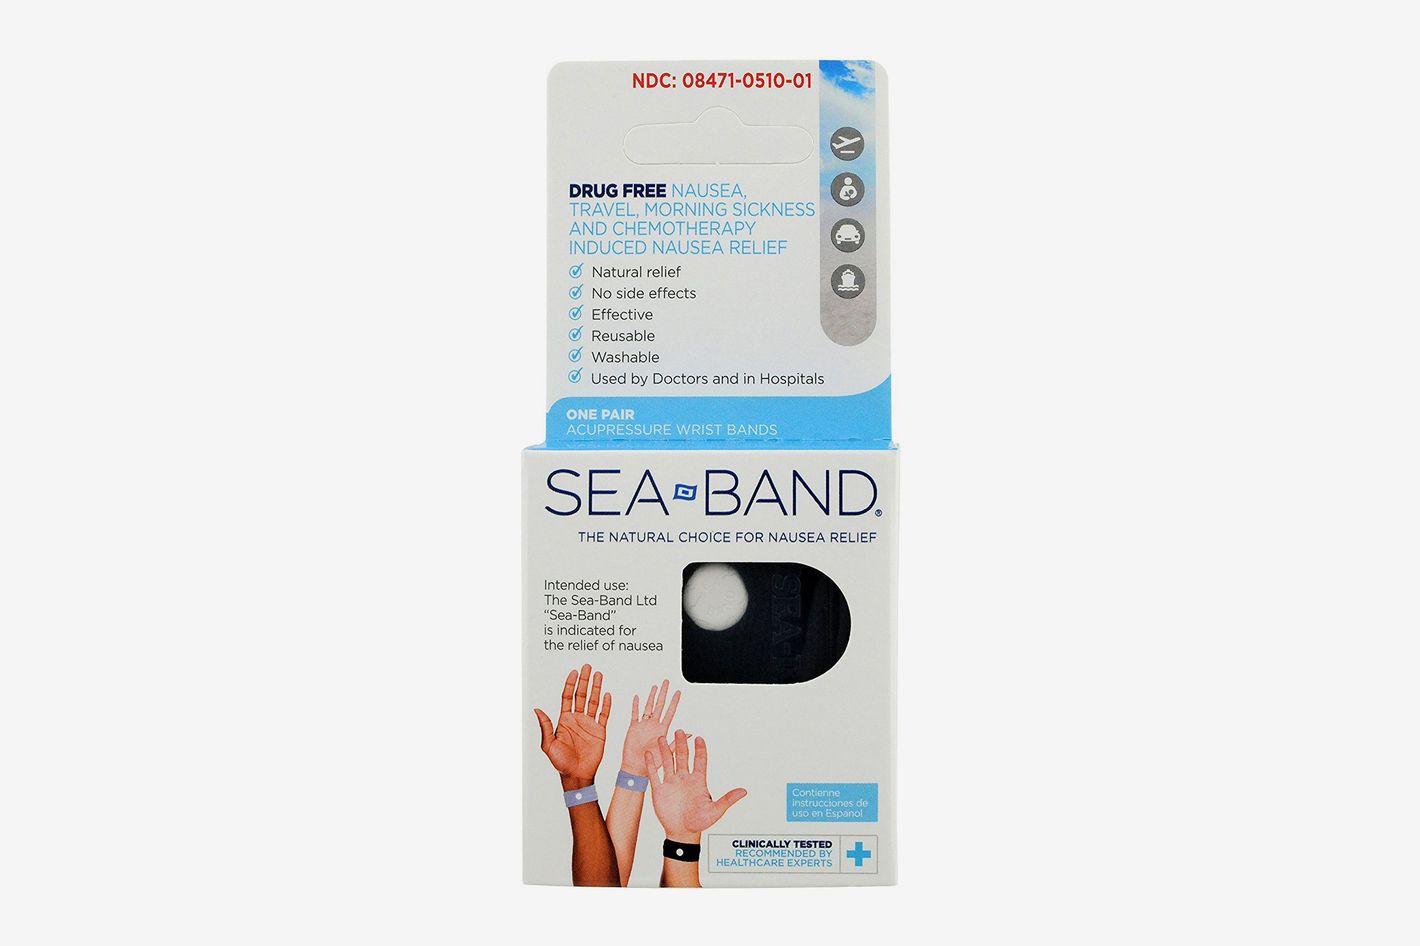 Sea Band Adult Wrist Band